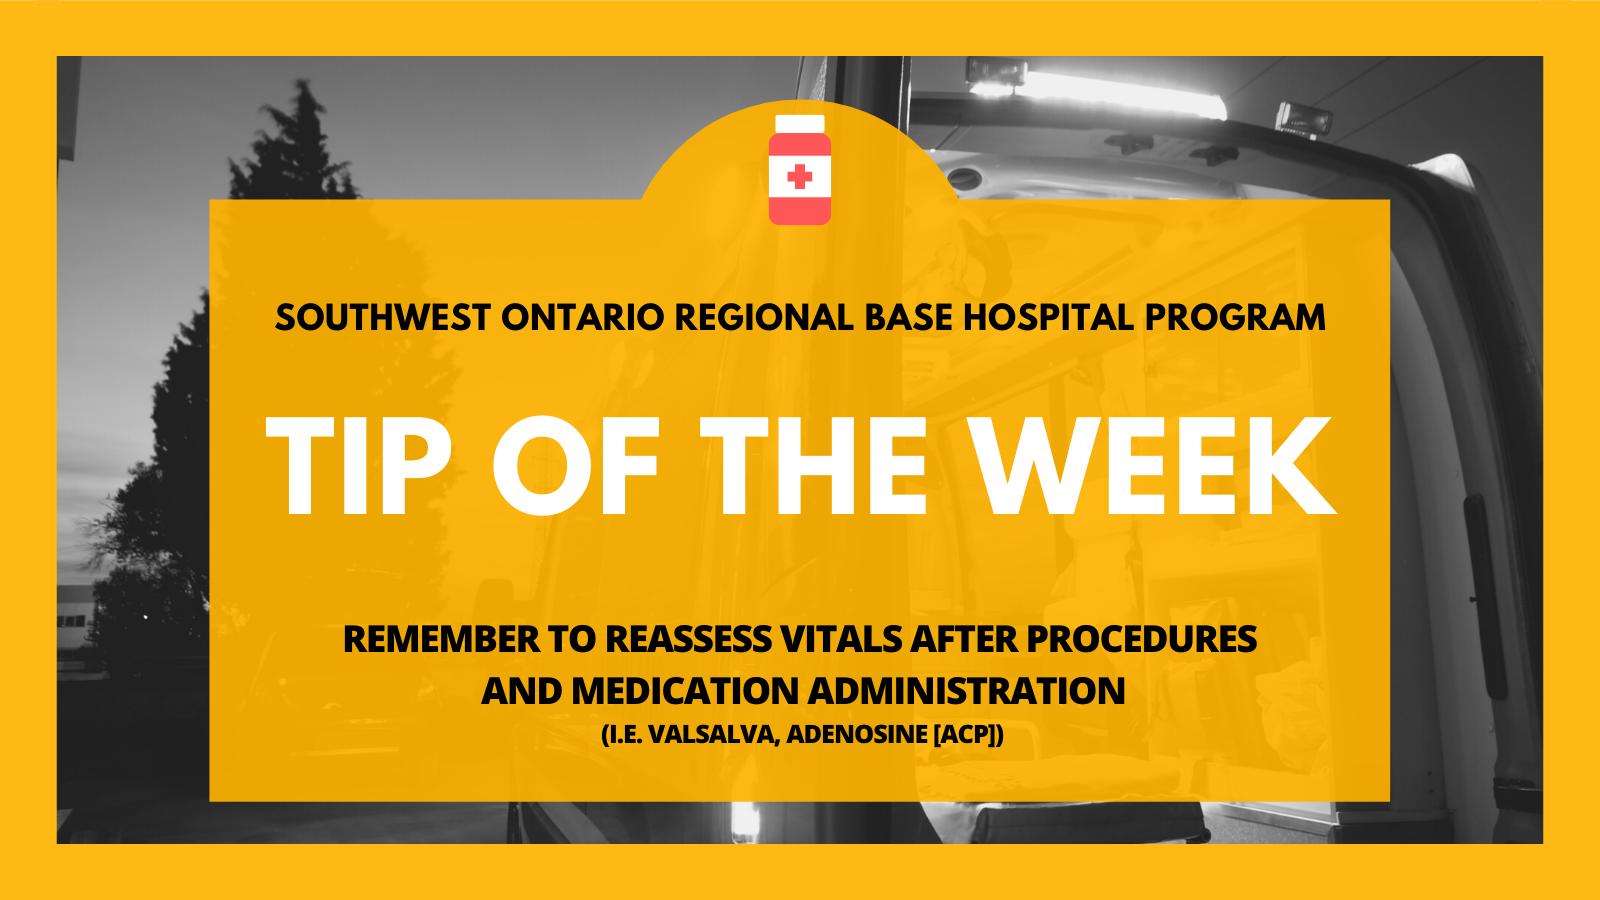 Remember to Reassess Vitals after Procedures and Medication Administration (i.e. Valsalva, Adenosine [ACP])